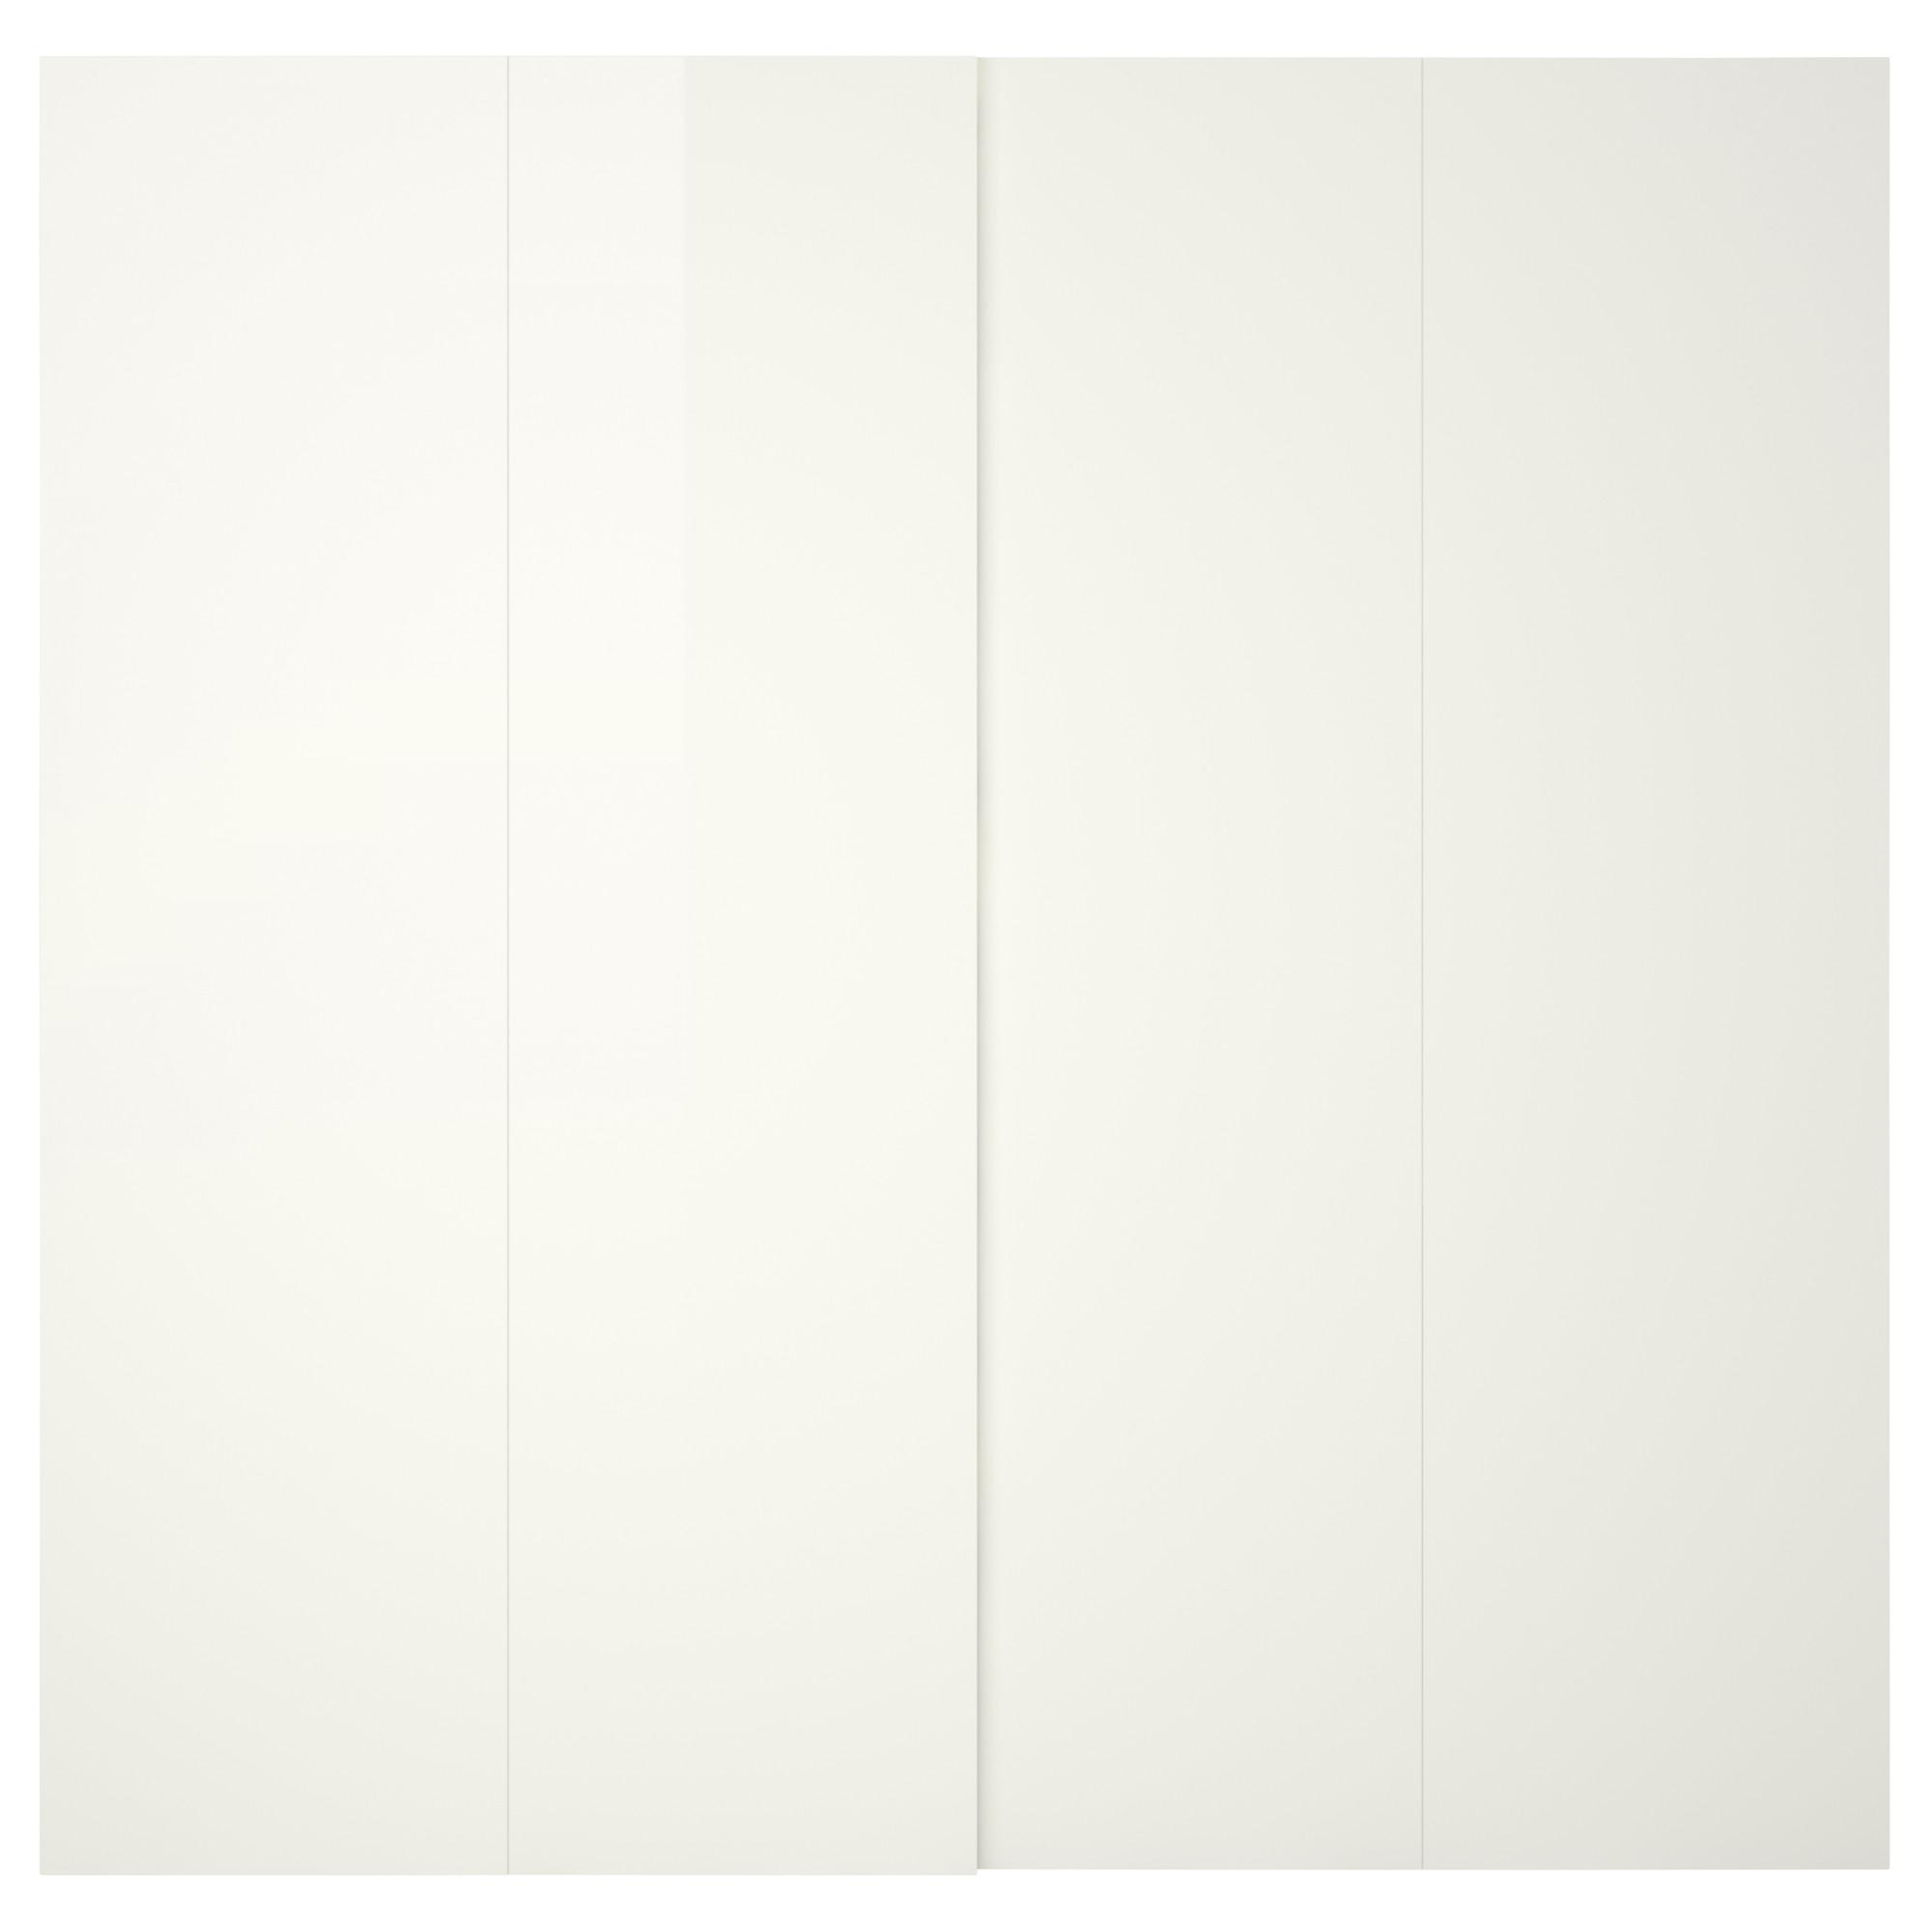 pax hasvik jeu 2 ptes coul 200x236 cm ikea p15b 0113 pinterest renseignement. Black Bedroom Furniture Sets. Home Design Ideas